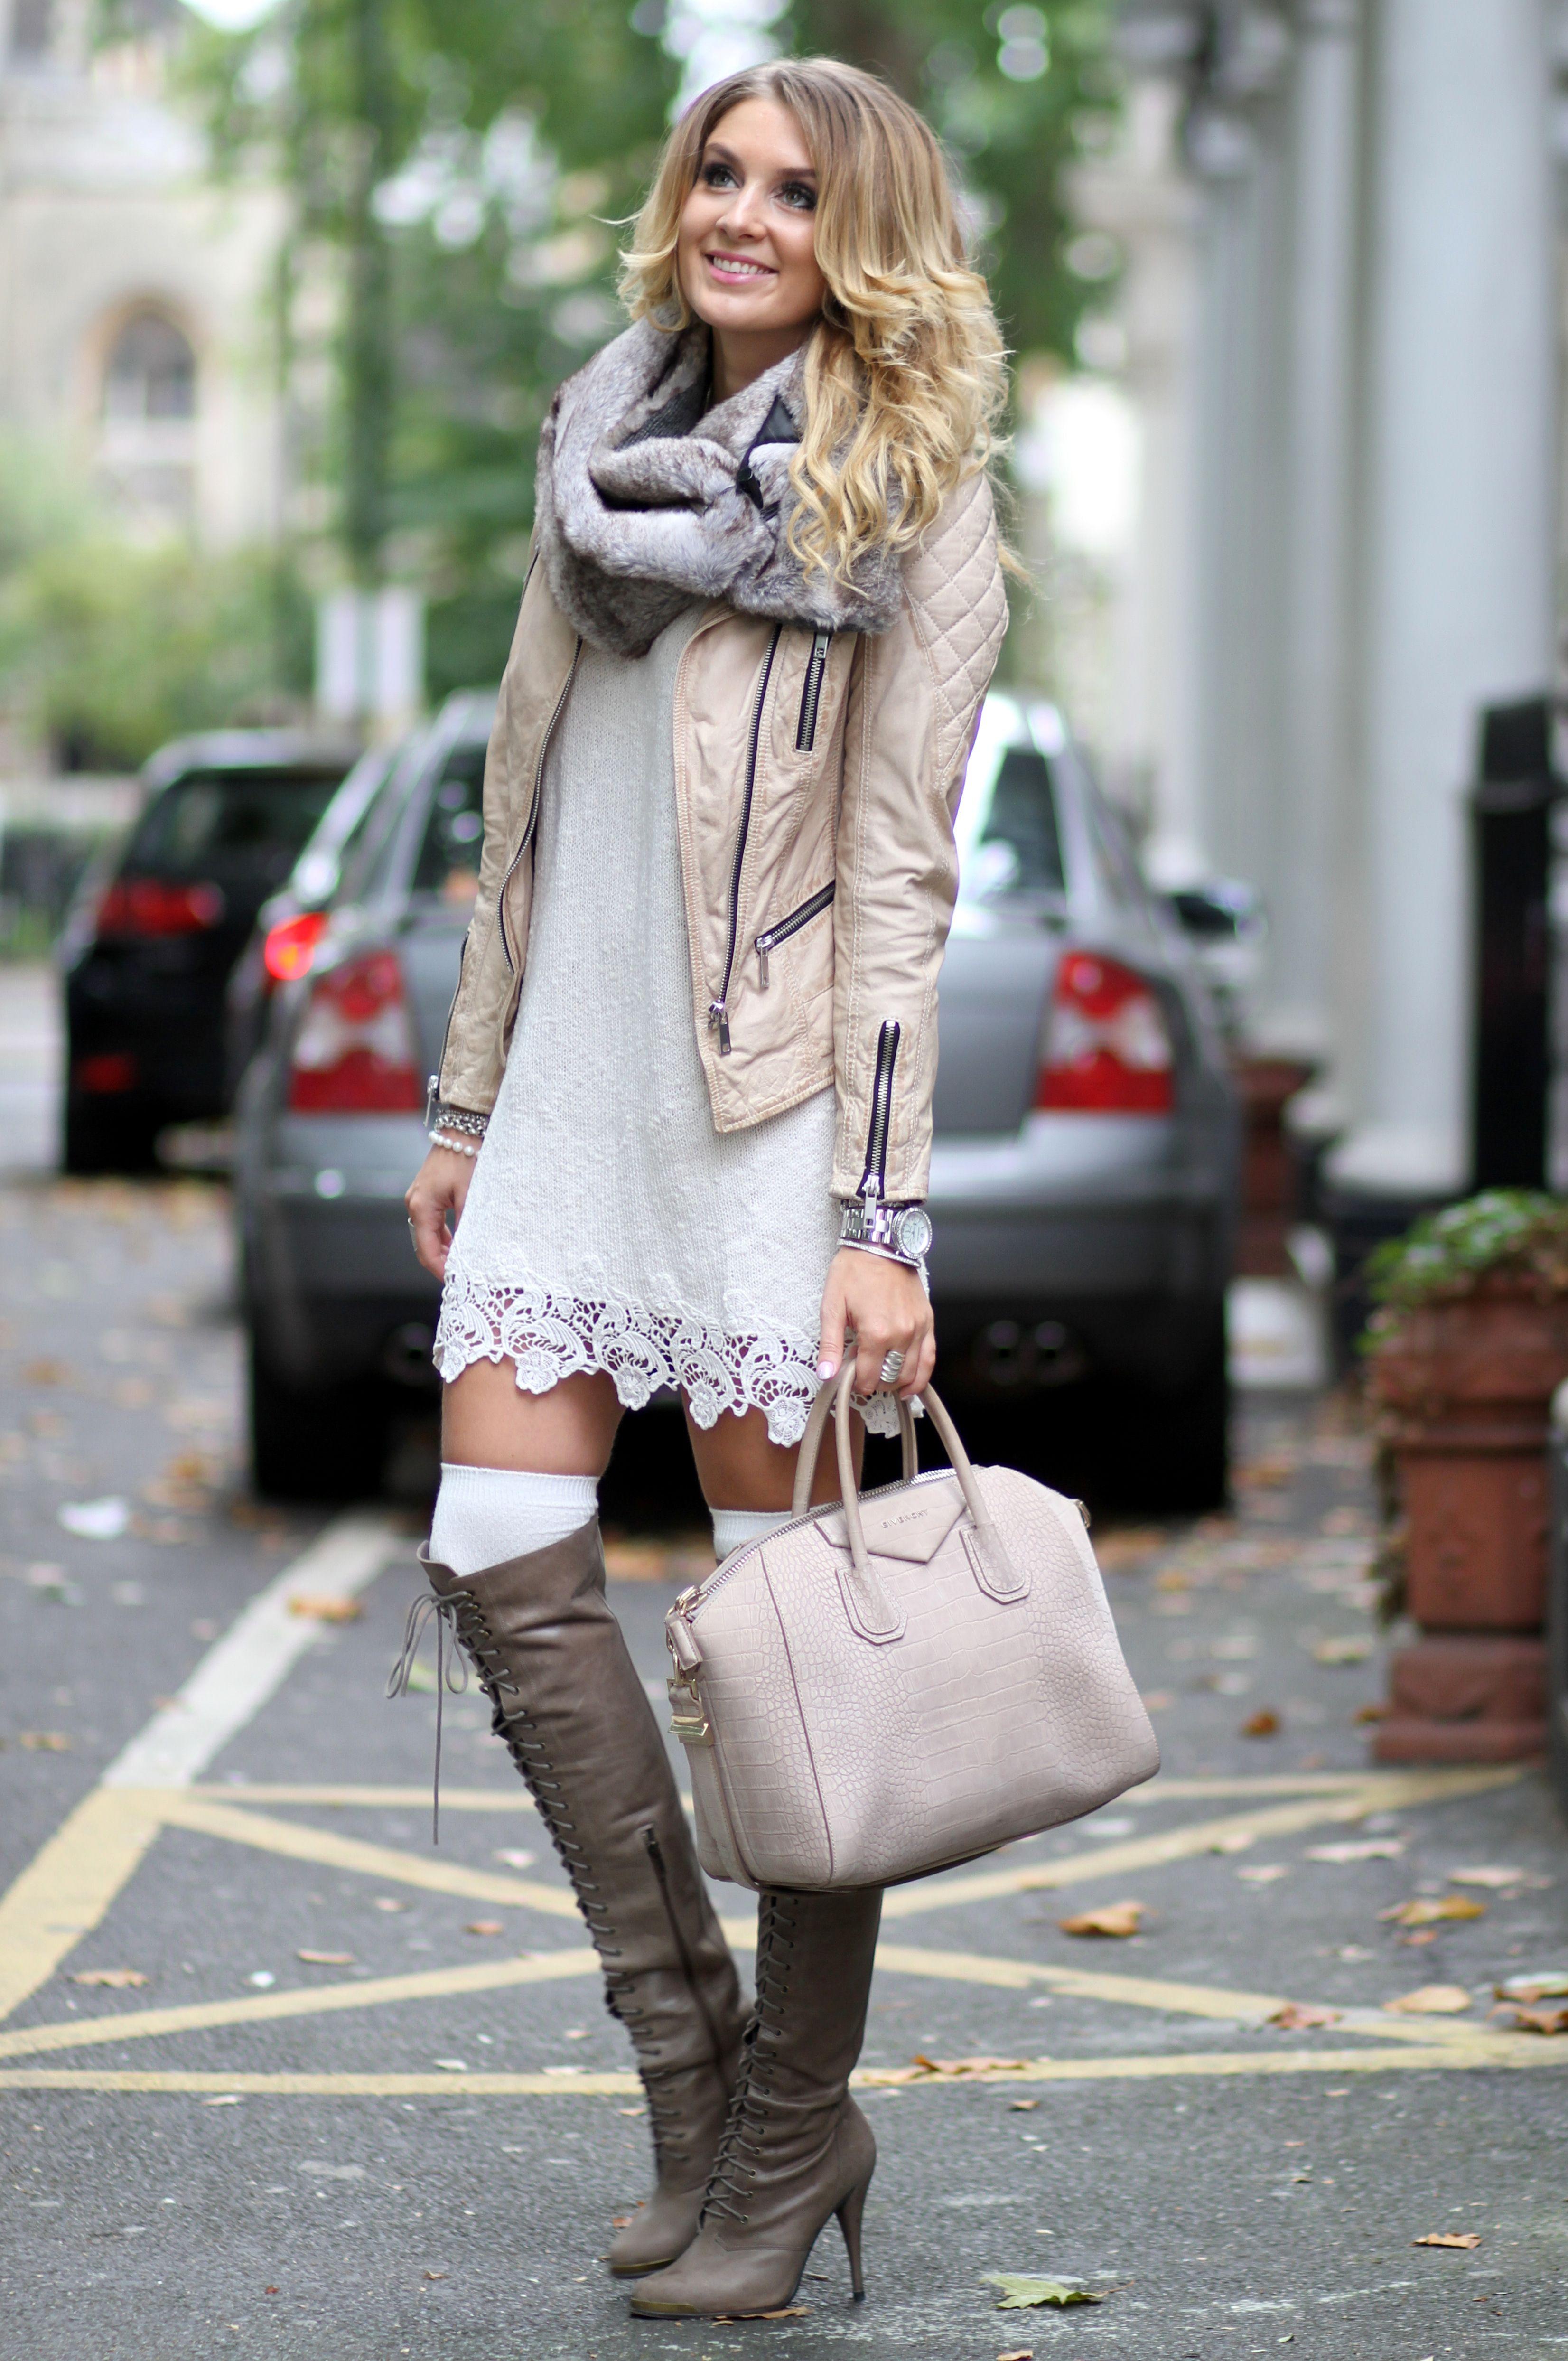 Jofama Leather Jacket Asos Dress H Amp M Men Fur Snood Joie